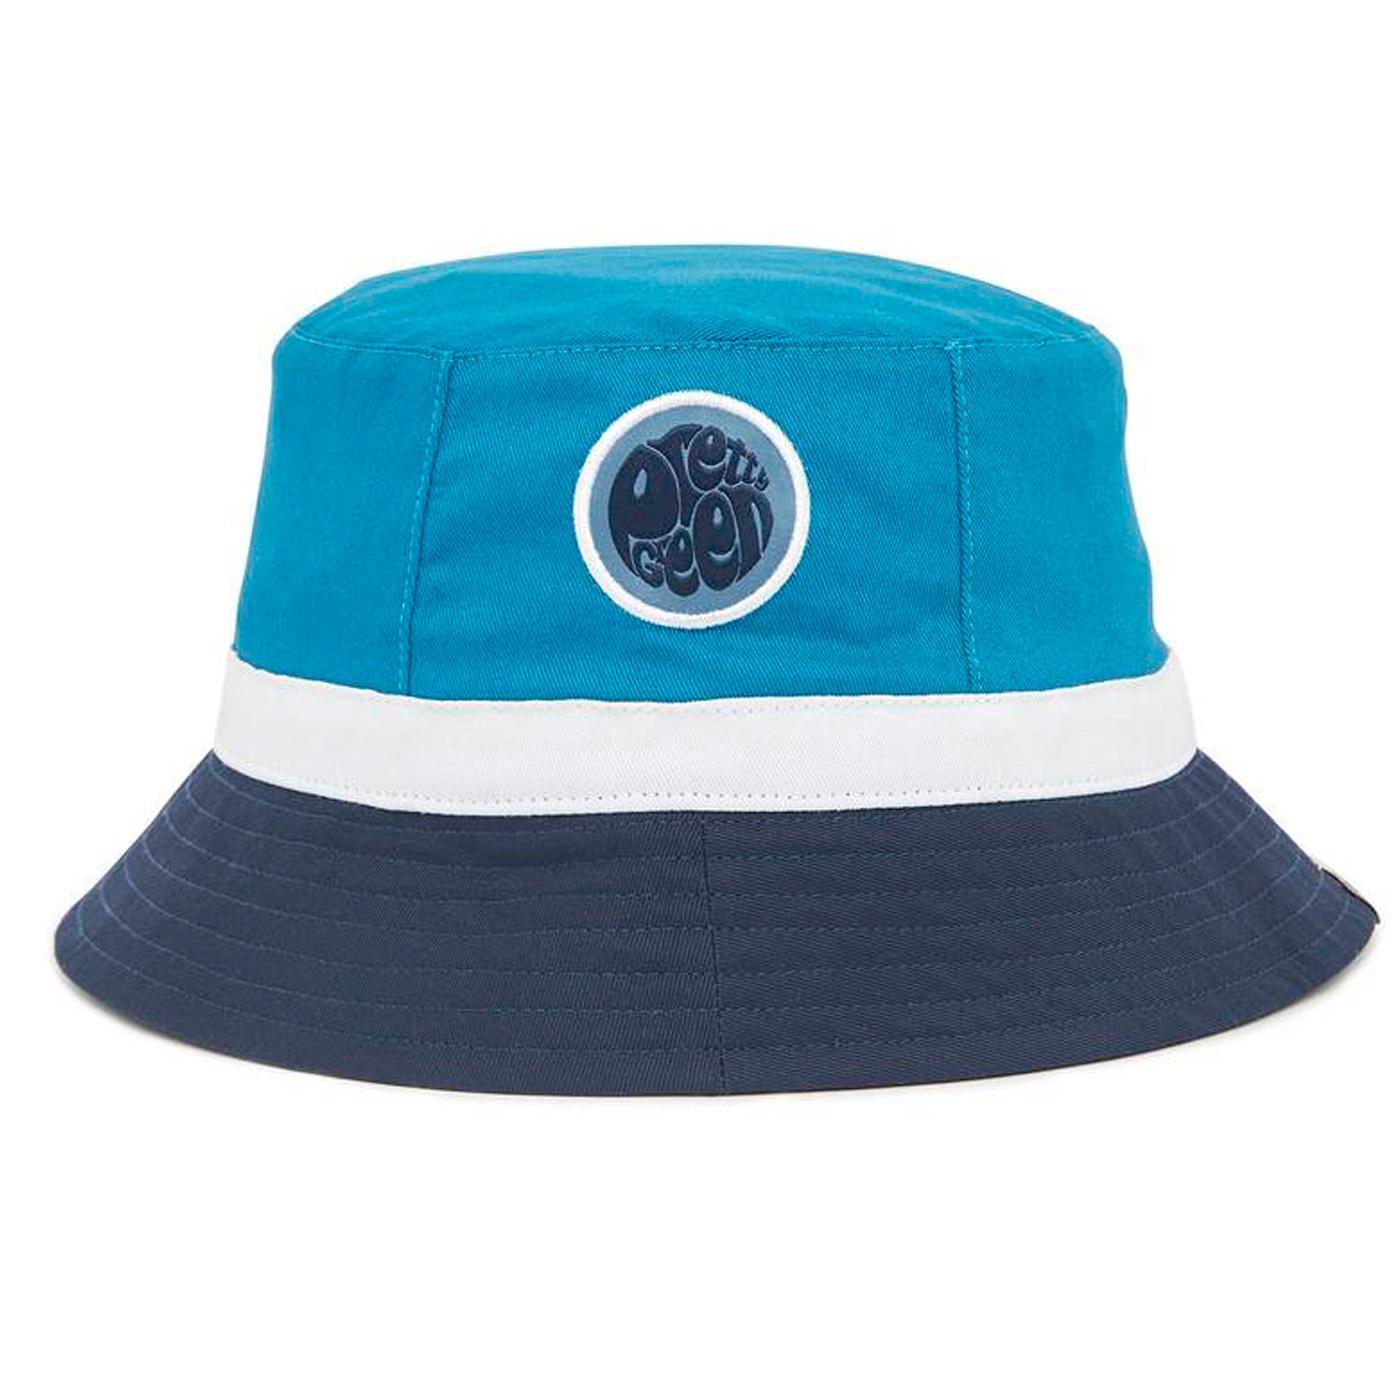 G20QMUACC017 colourblock bucket hat blue